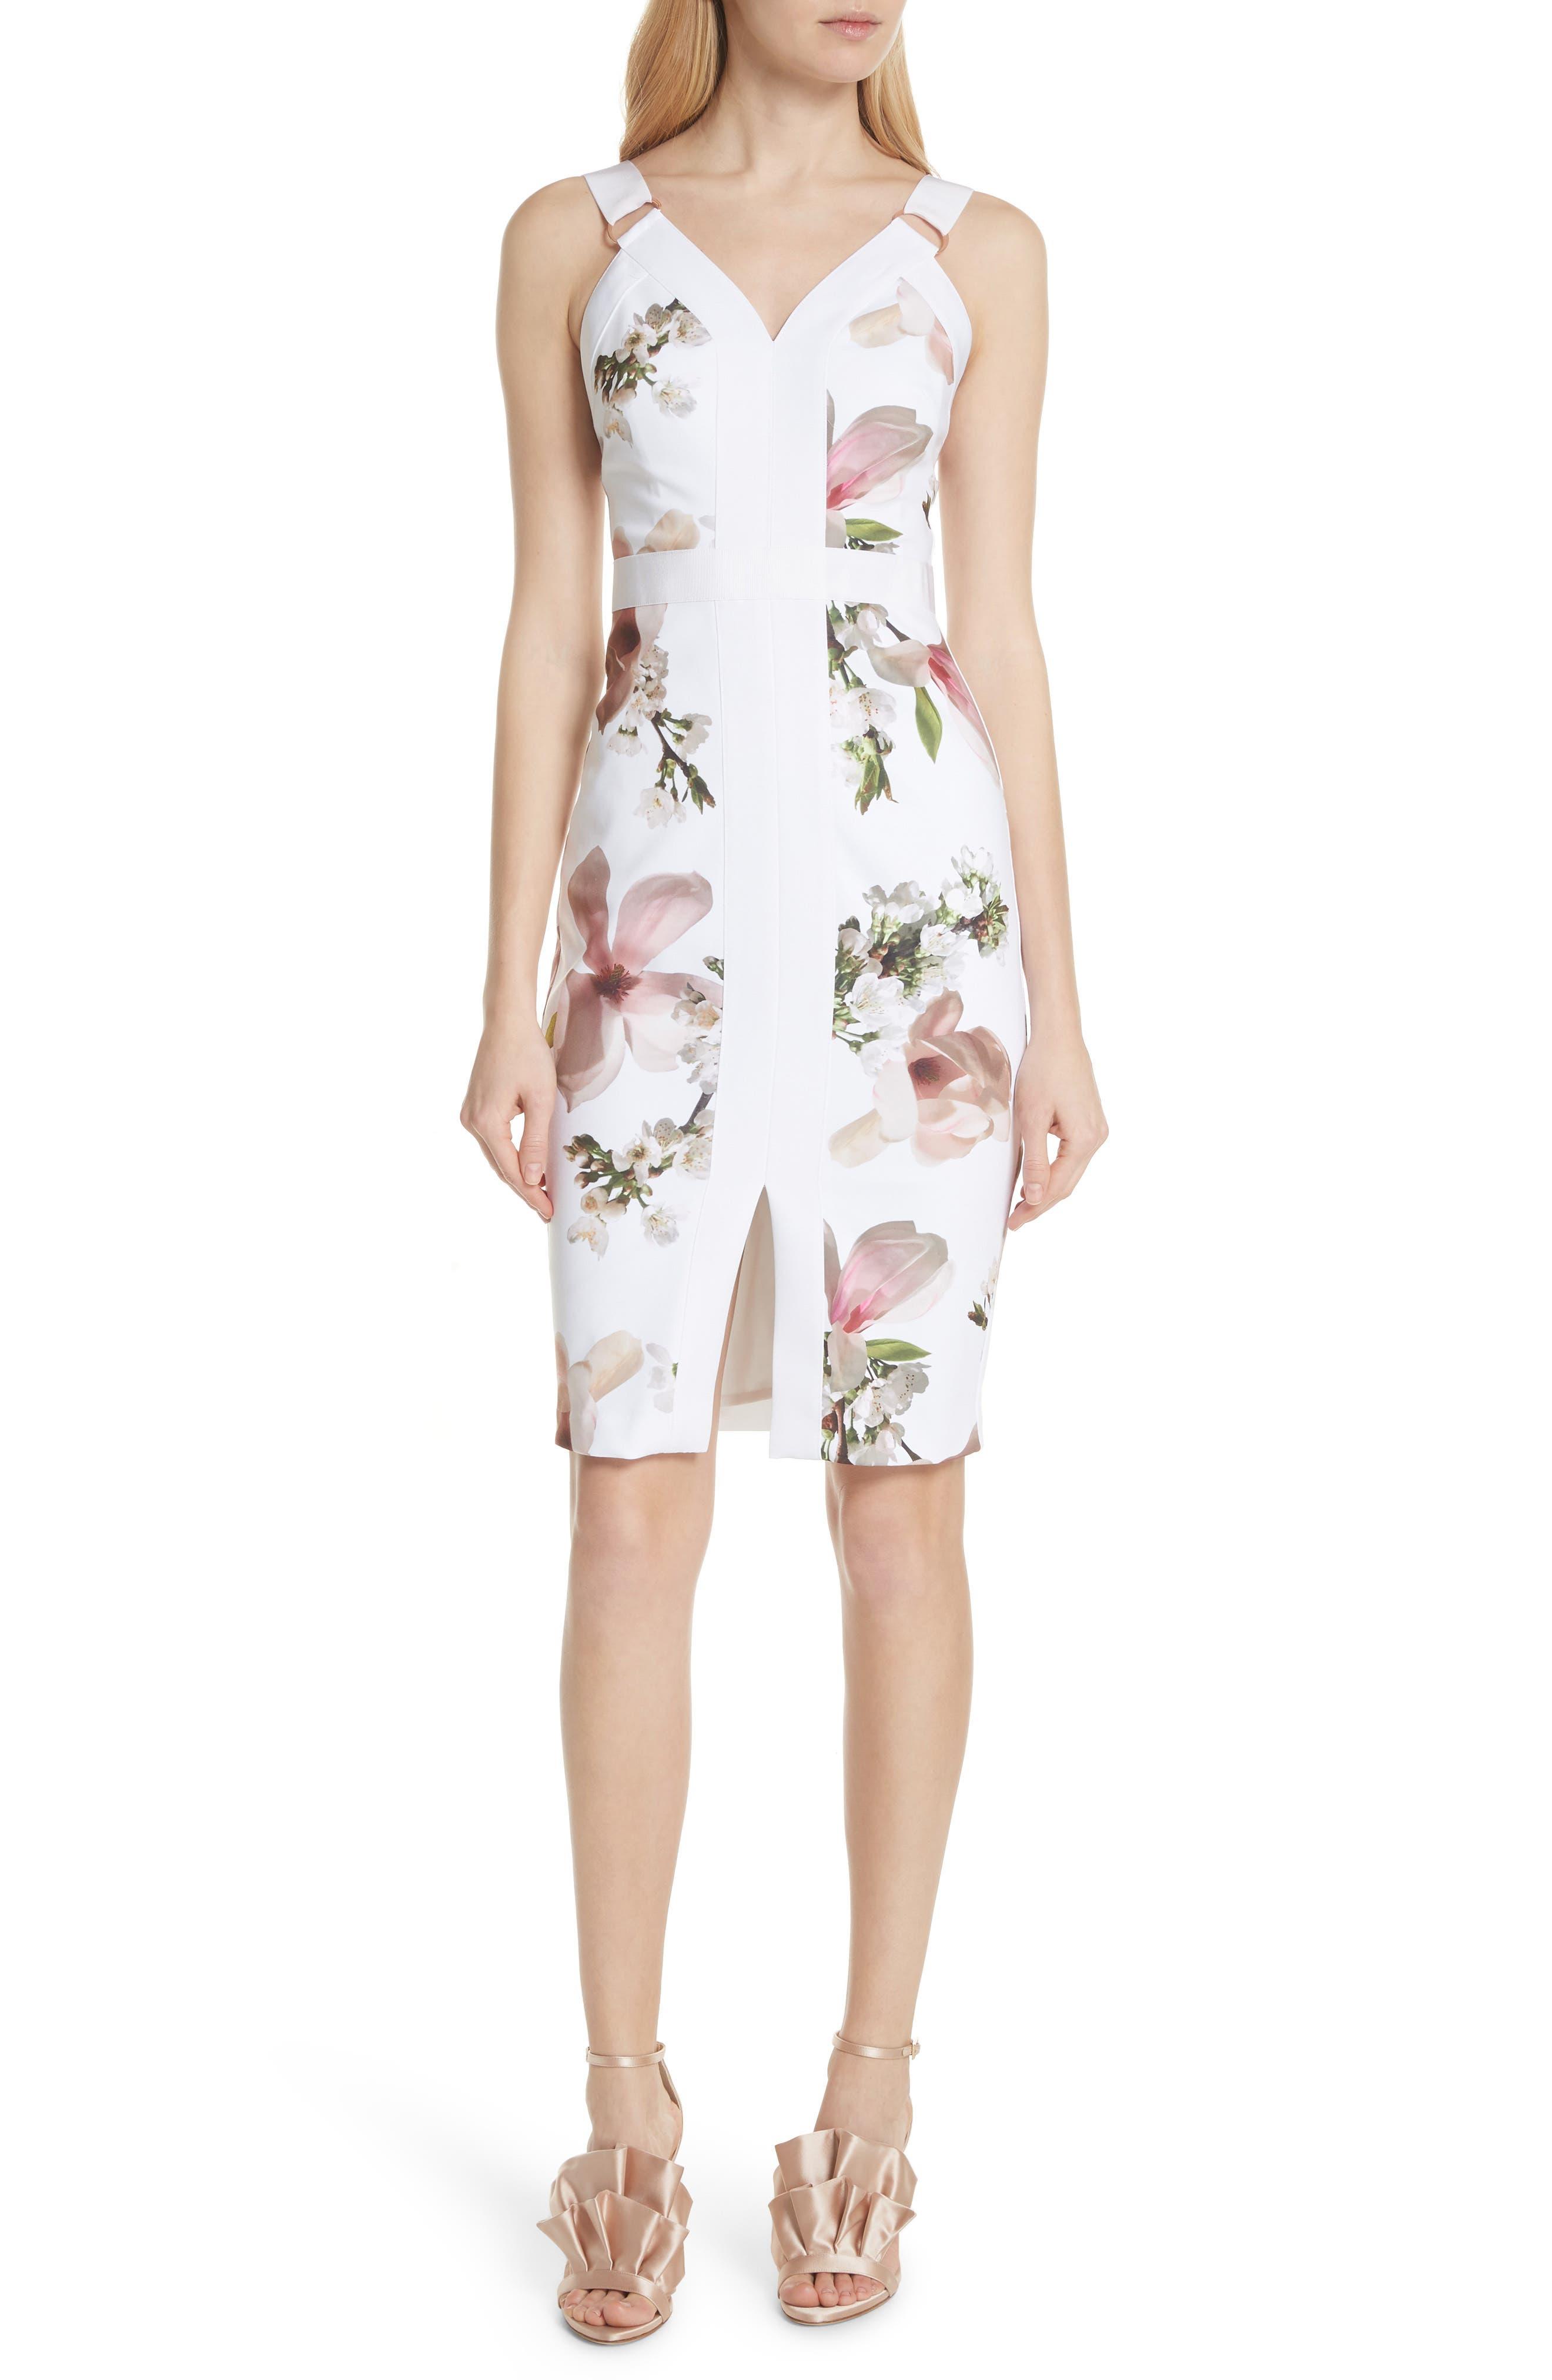 Harmony Floral Sheath Dress,                             Main thumbnail 1, color,                             White